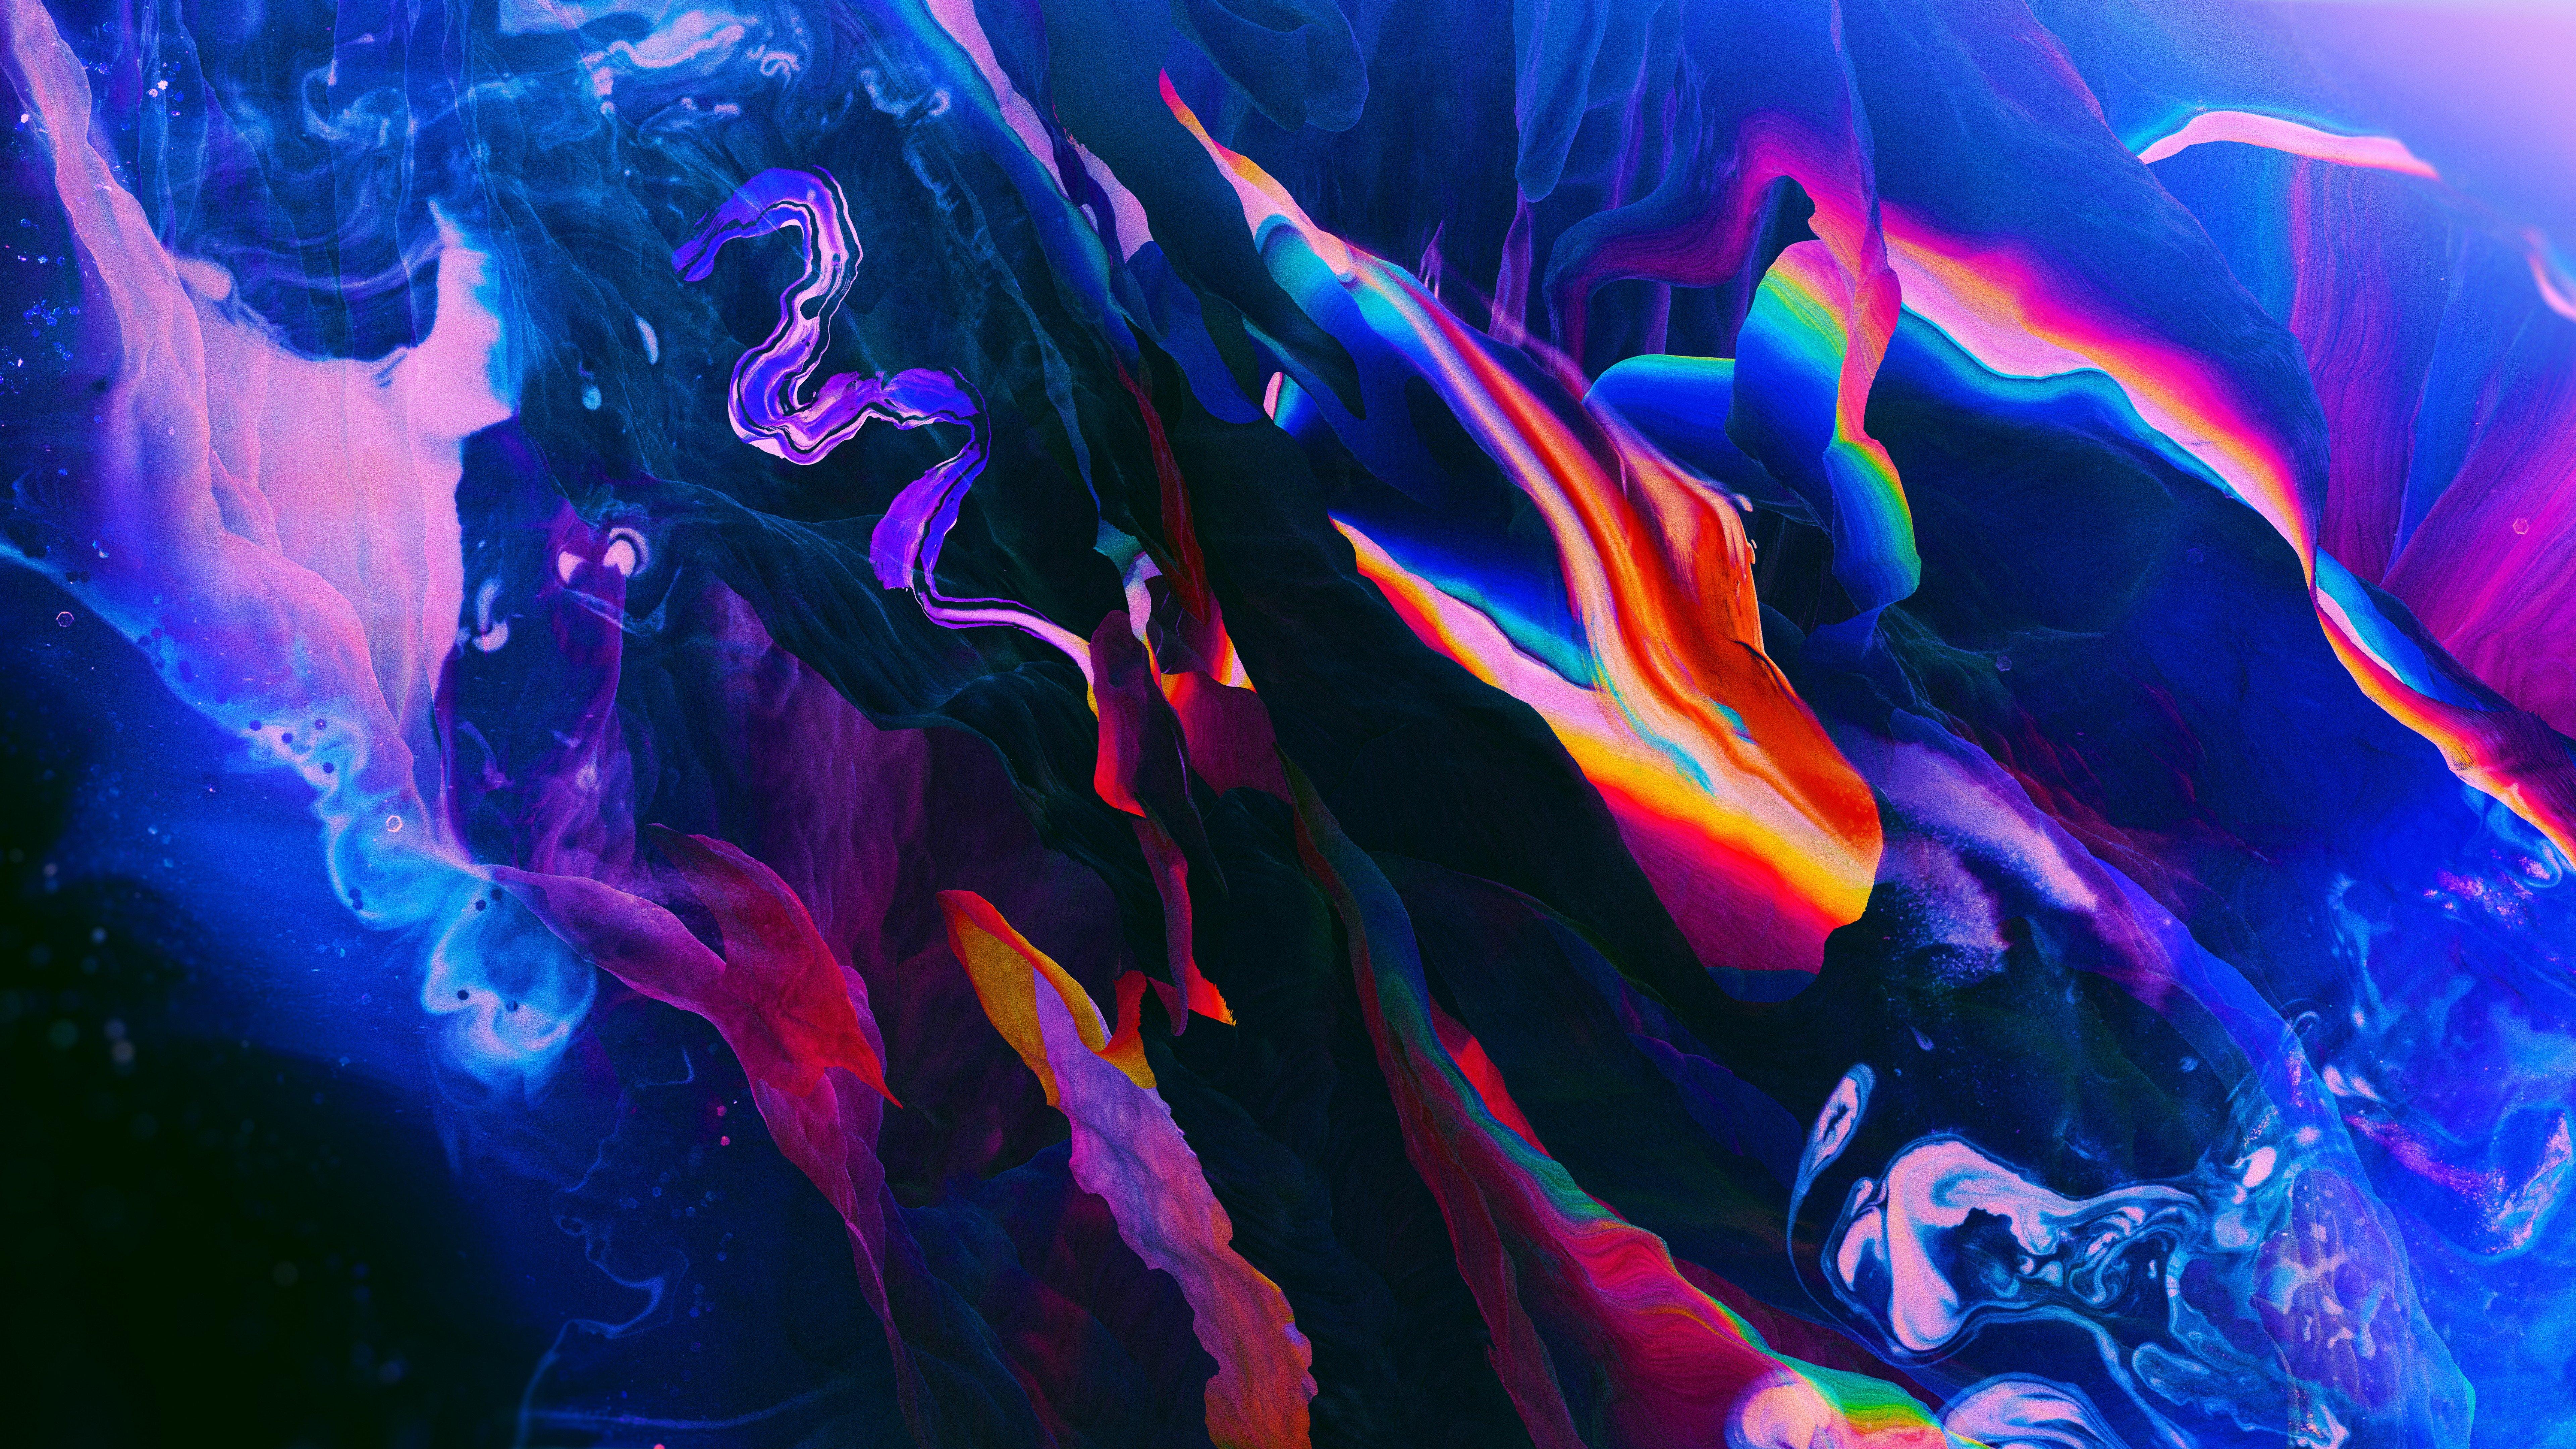 Fondos de pantalla Colorido arte digital